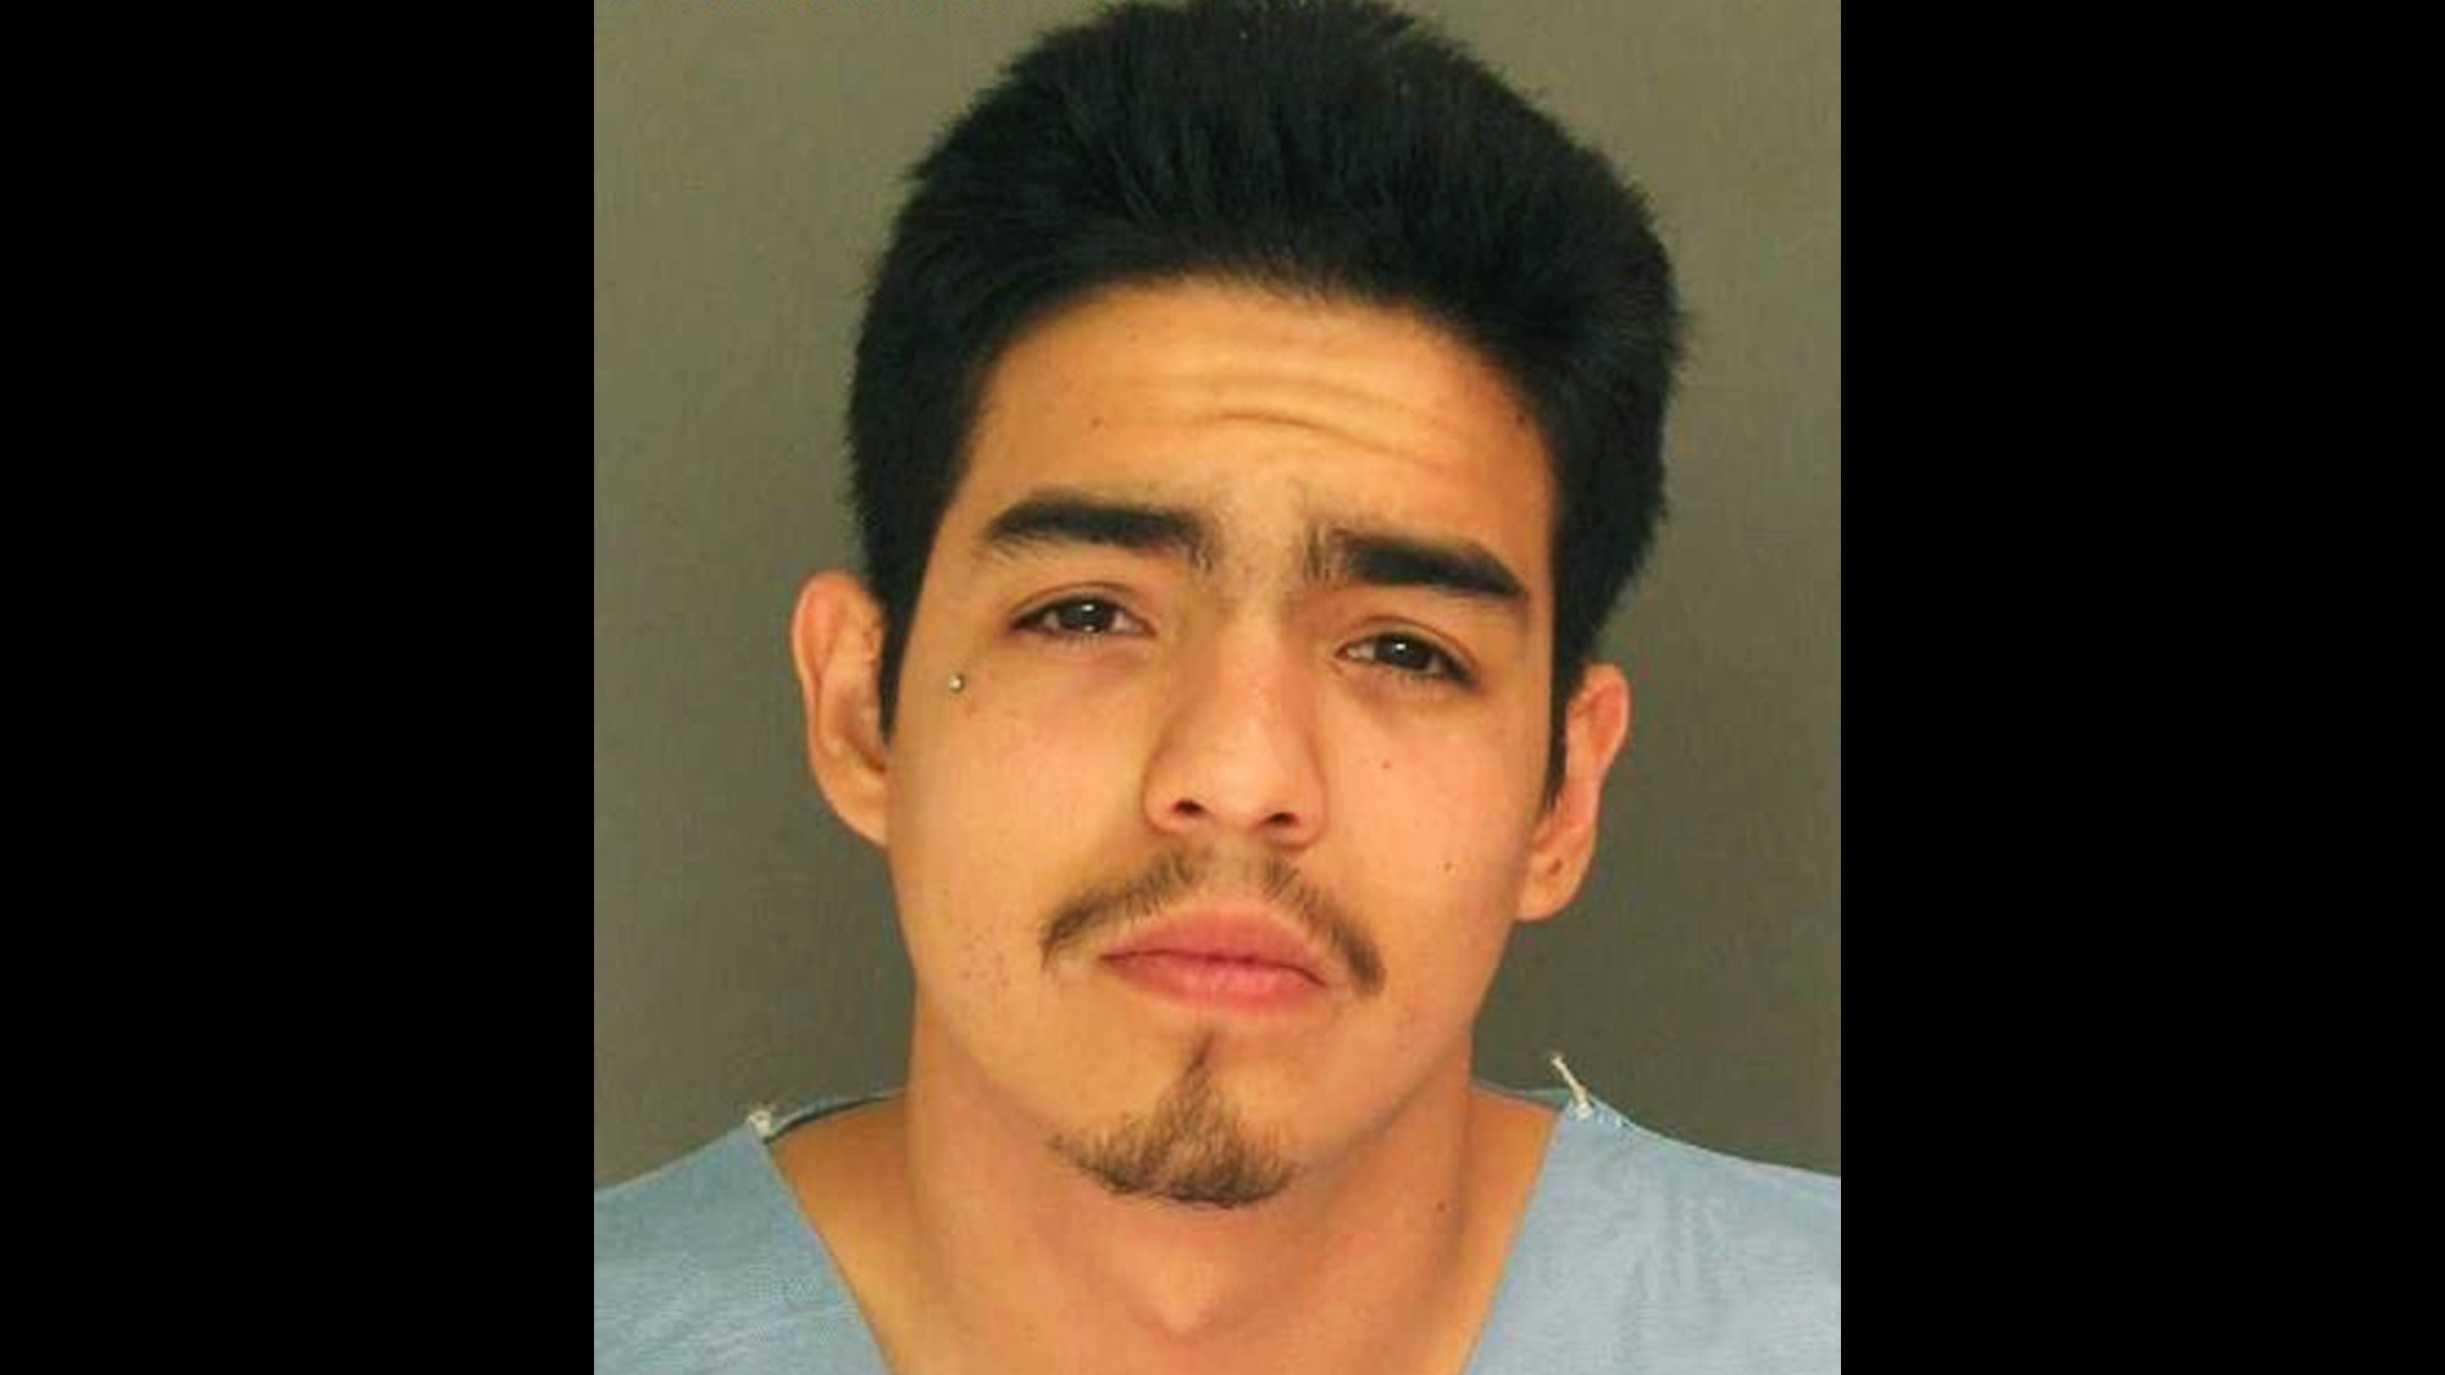 Diego Santino Sanchez, 22, of Watsonville